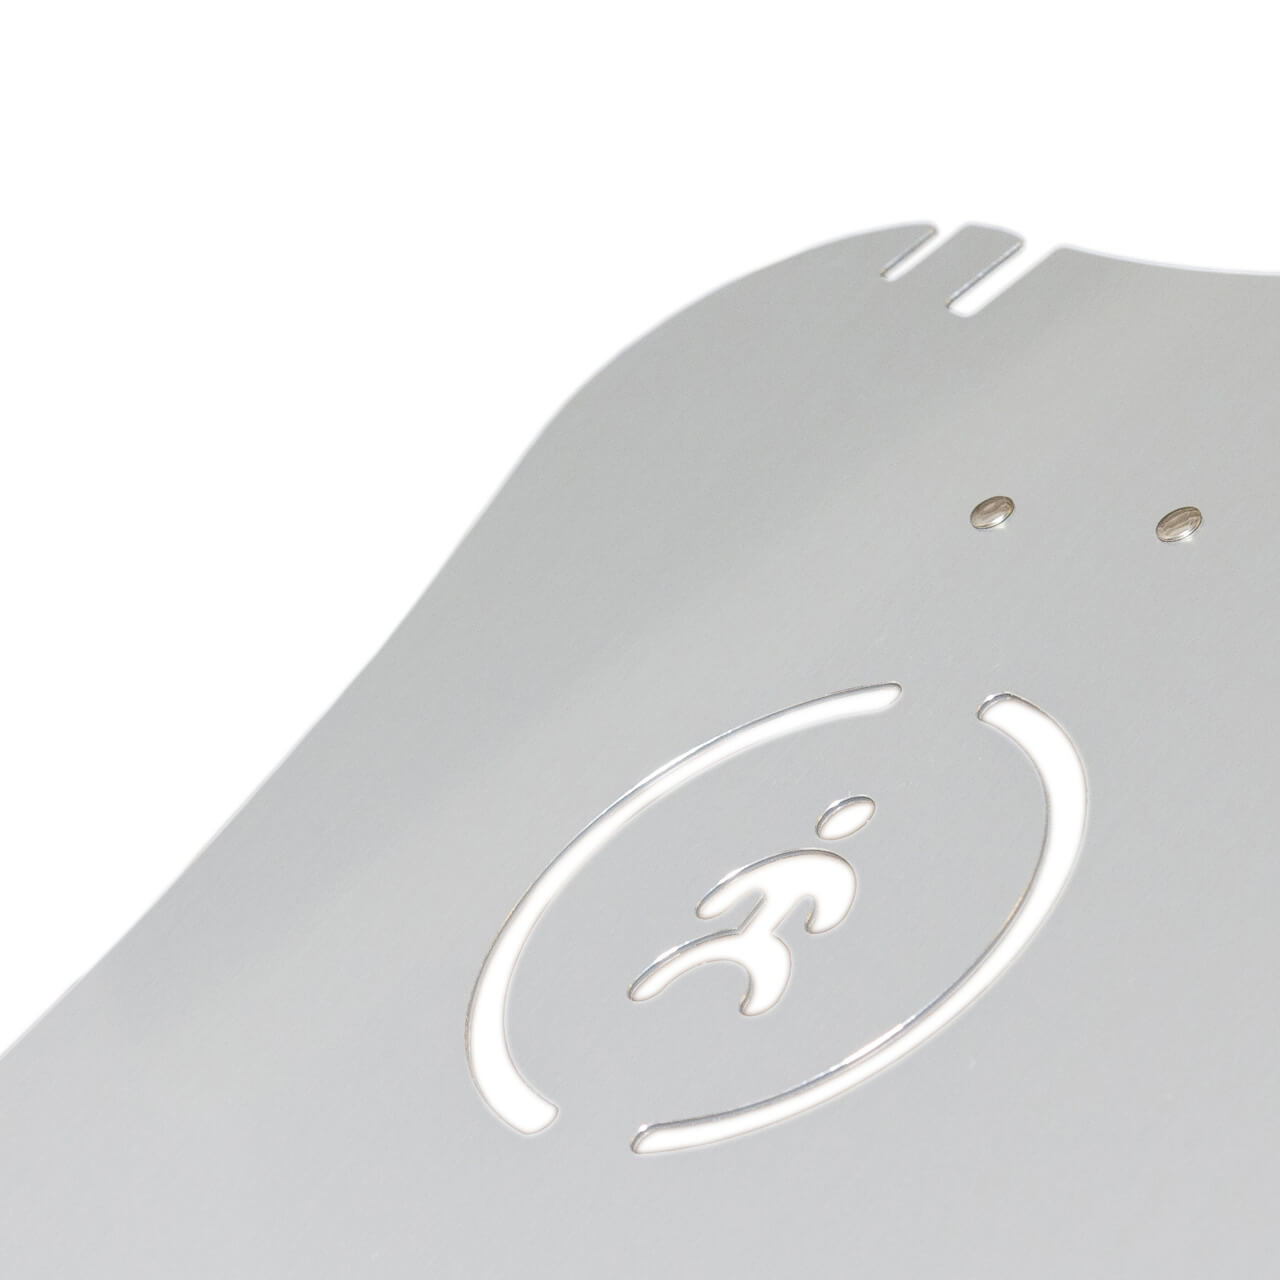 Topmate II laptopstandaard